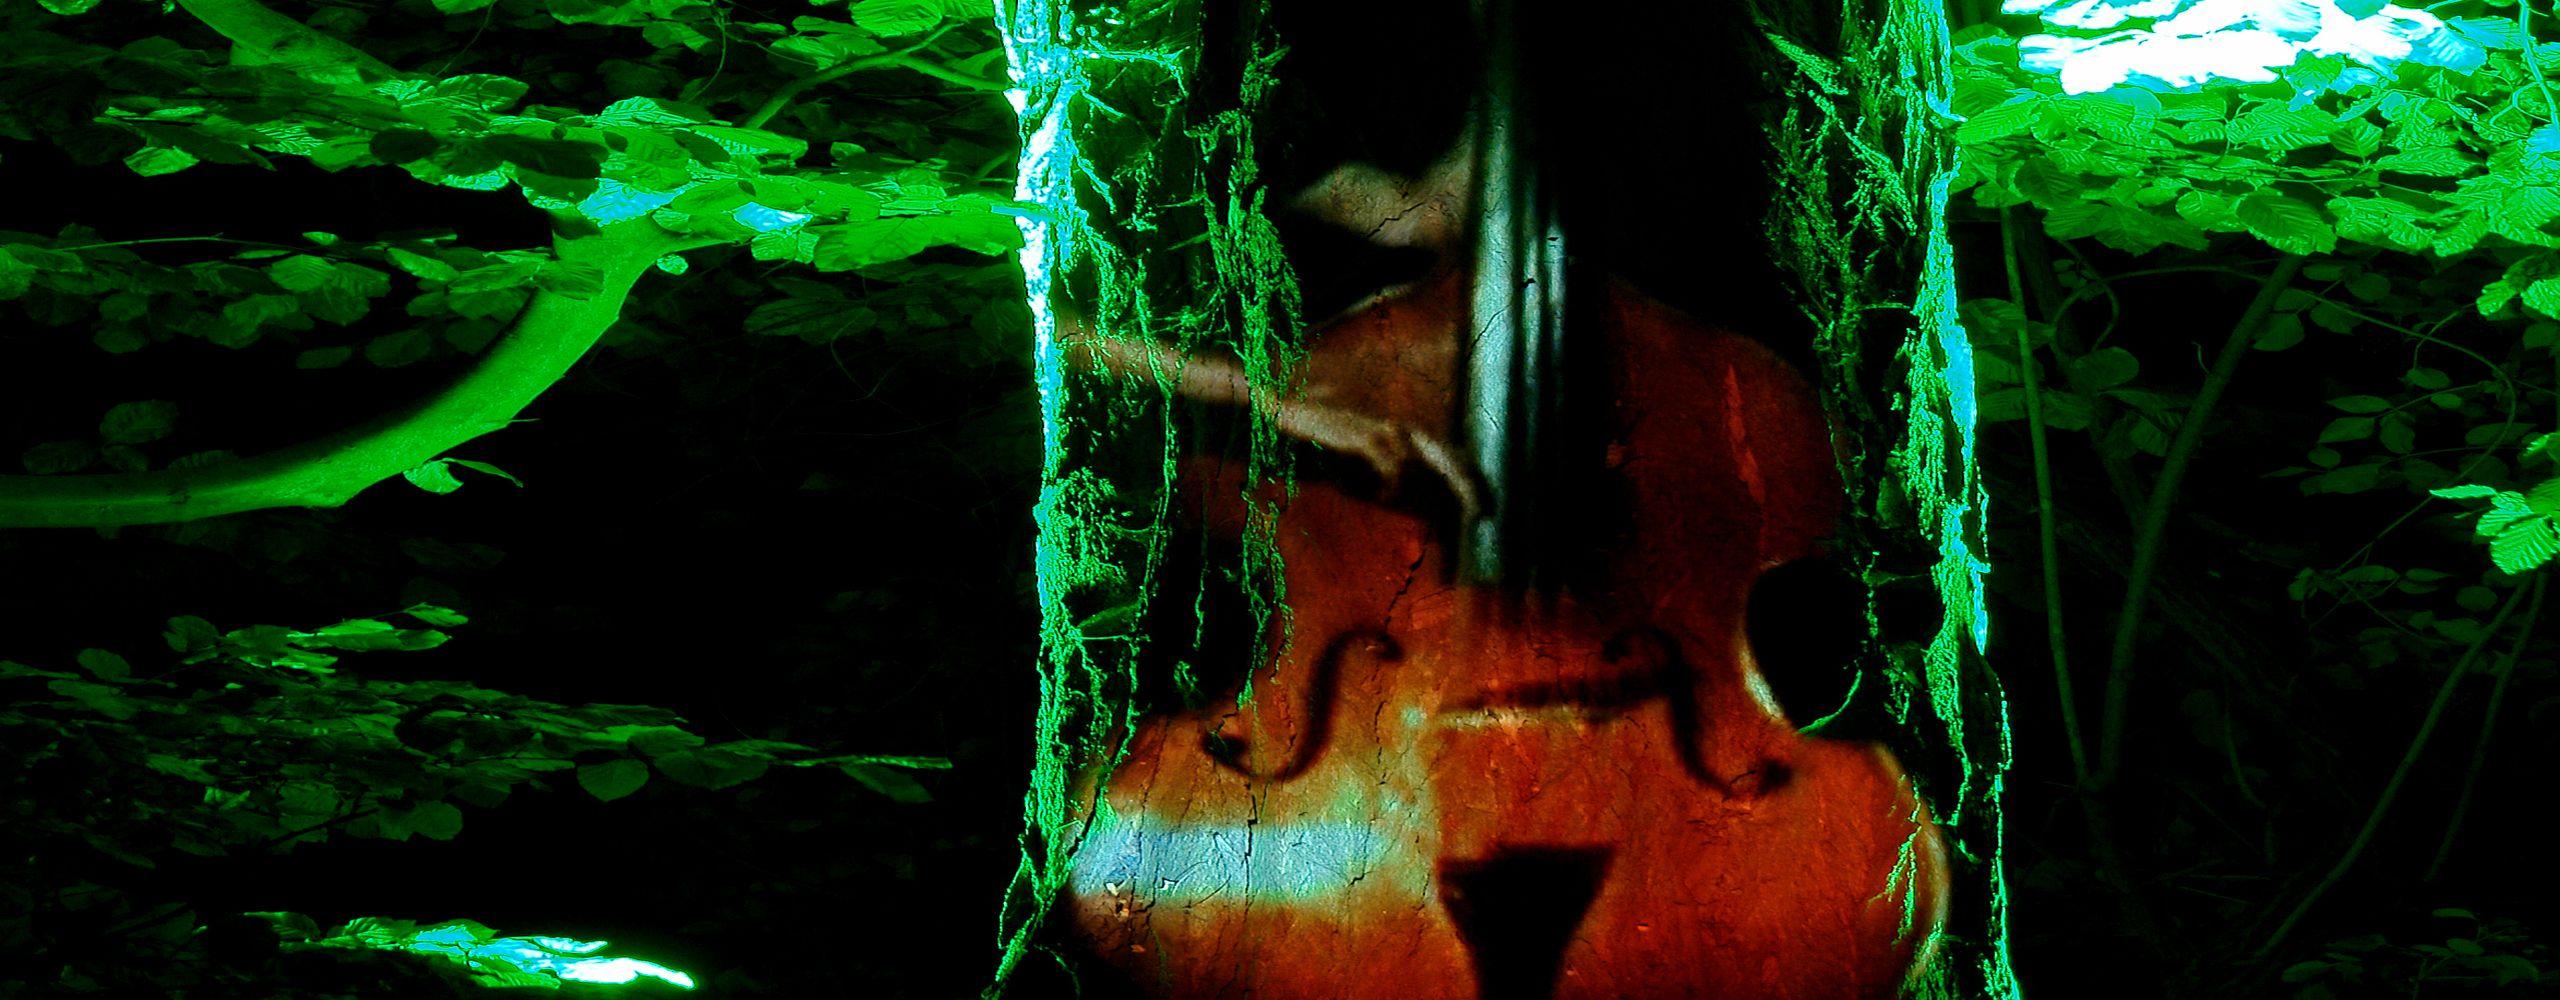 Parksymphonie_Cellobaum_Foto Bodo Brauer